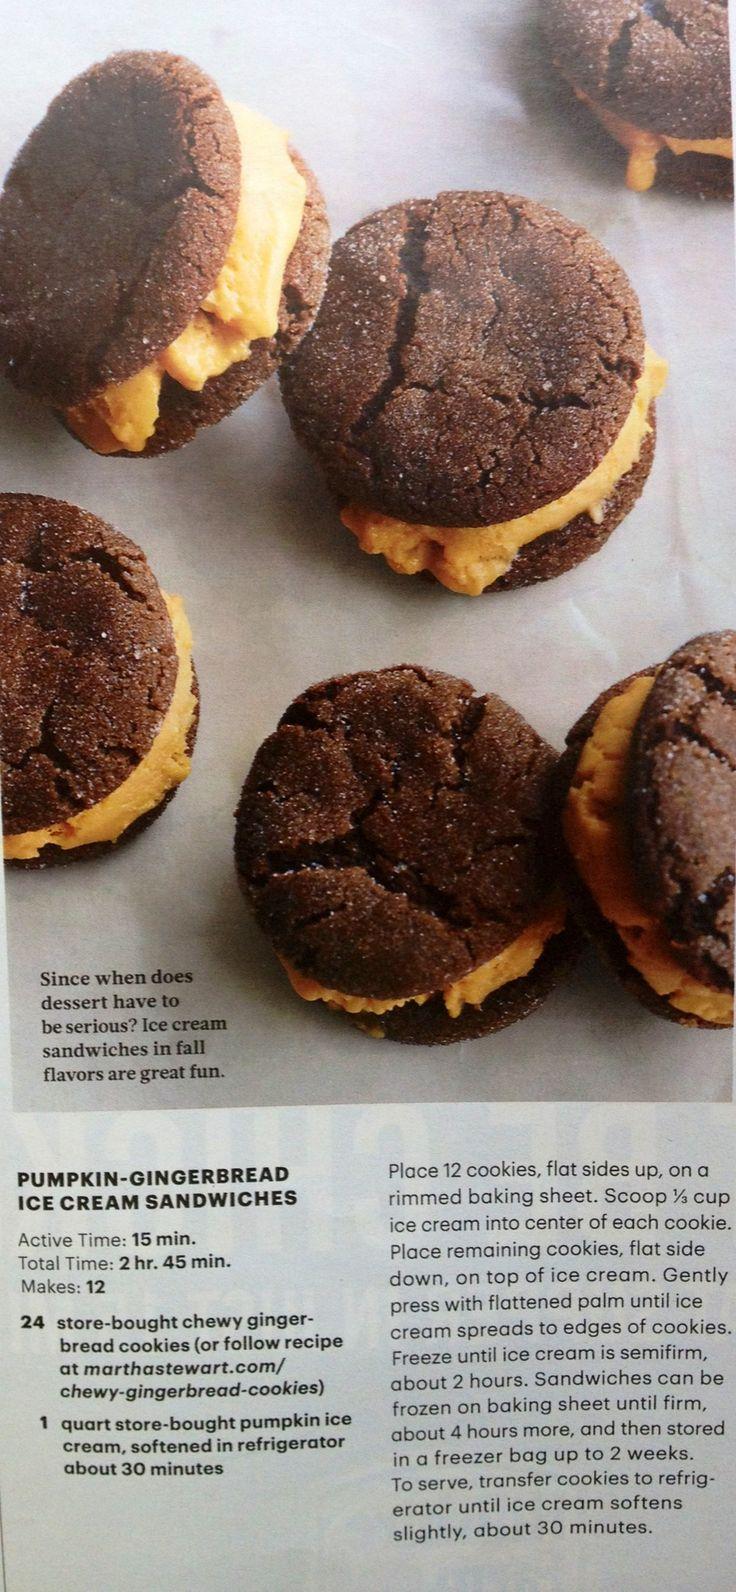 Pumpkin-gingerbread Ice cream Sandwiches | Martha Stewart Living | Oct ...